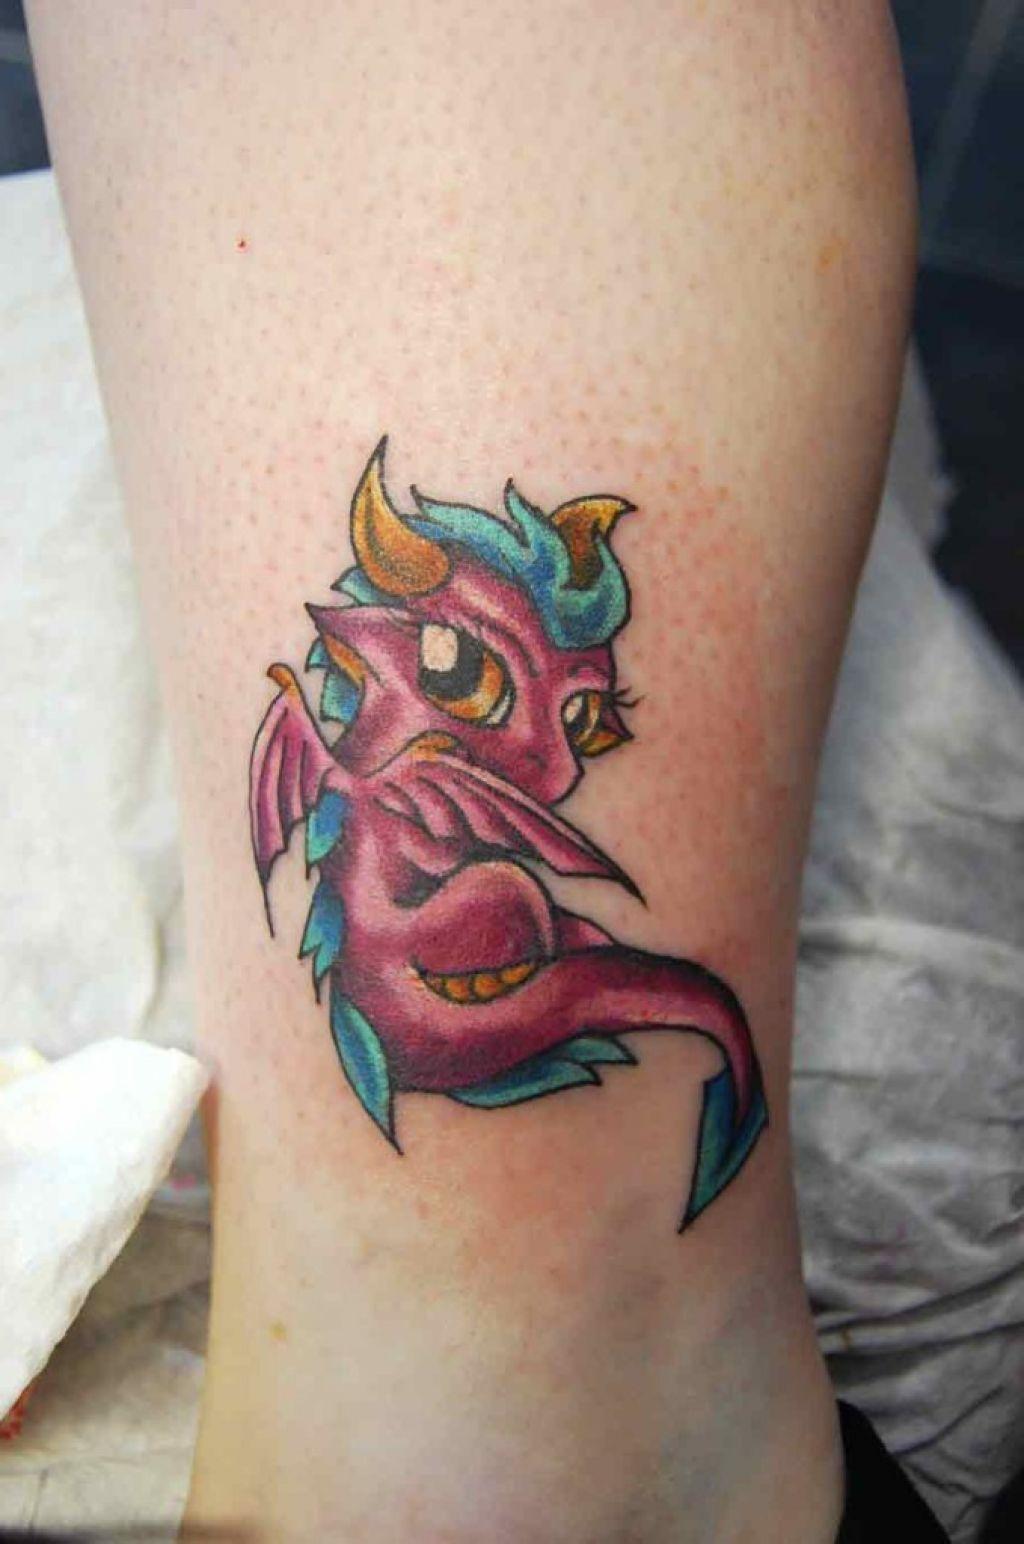 Cute baby dragon tattoos ideas dragon tattoo pinterest for Baby dragon tattoos